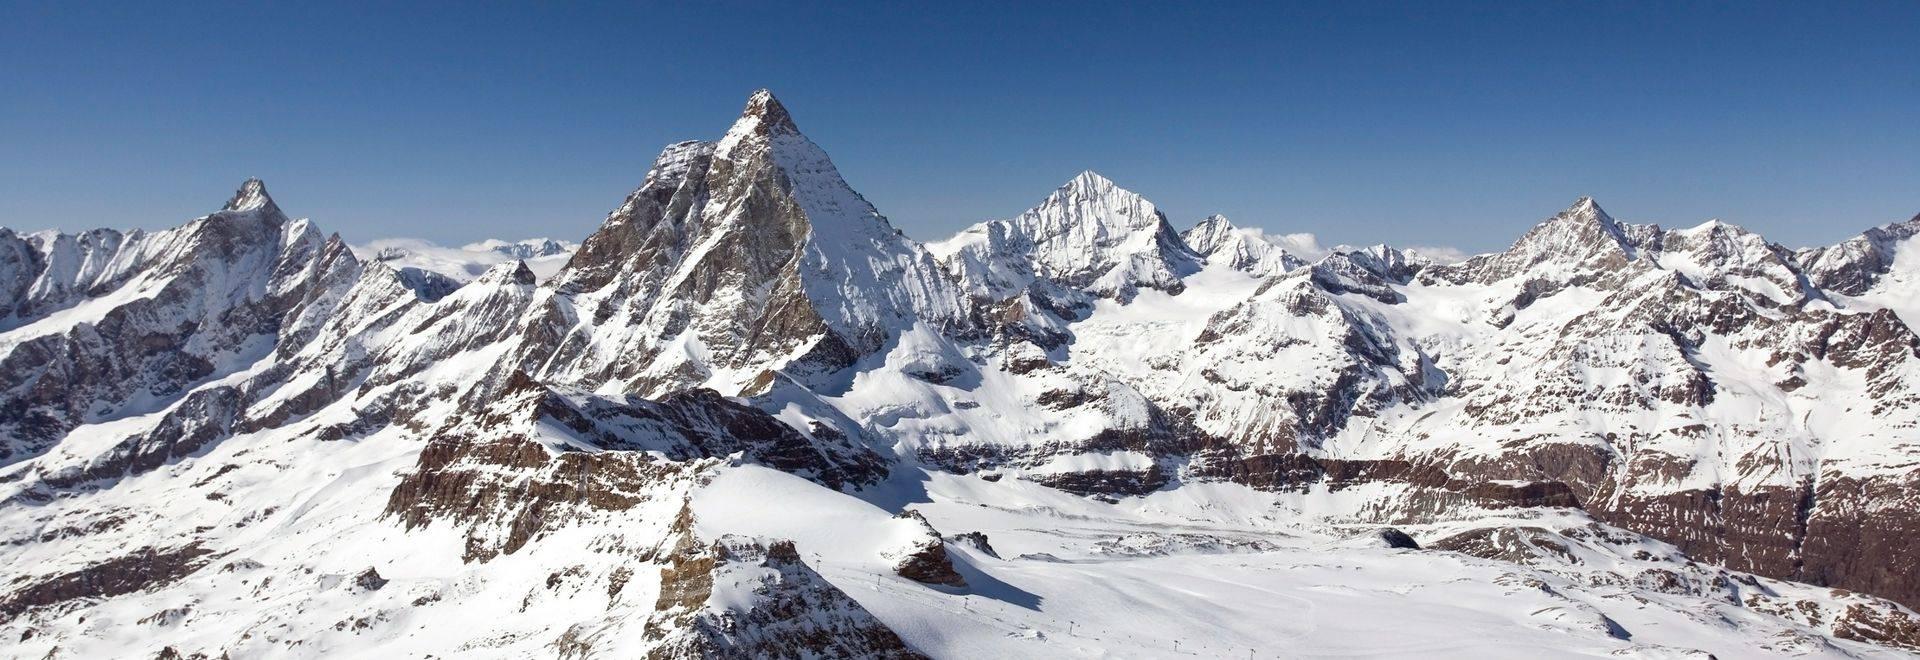 Dreamstime 4756172 Ski The Bernese Oberland